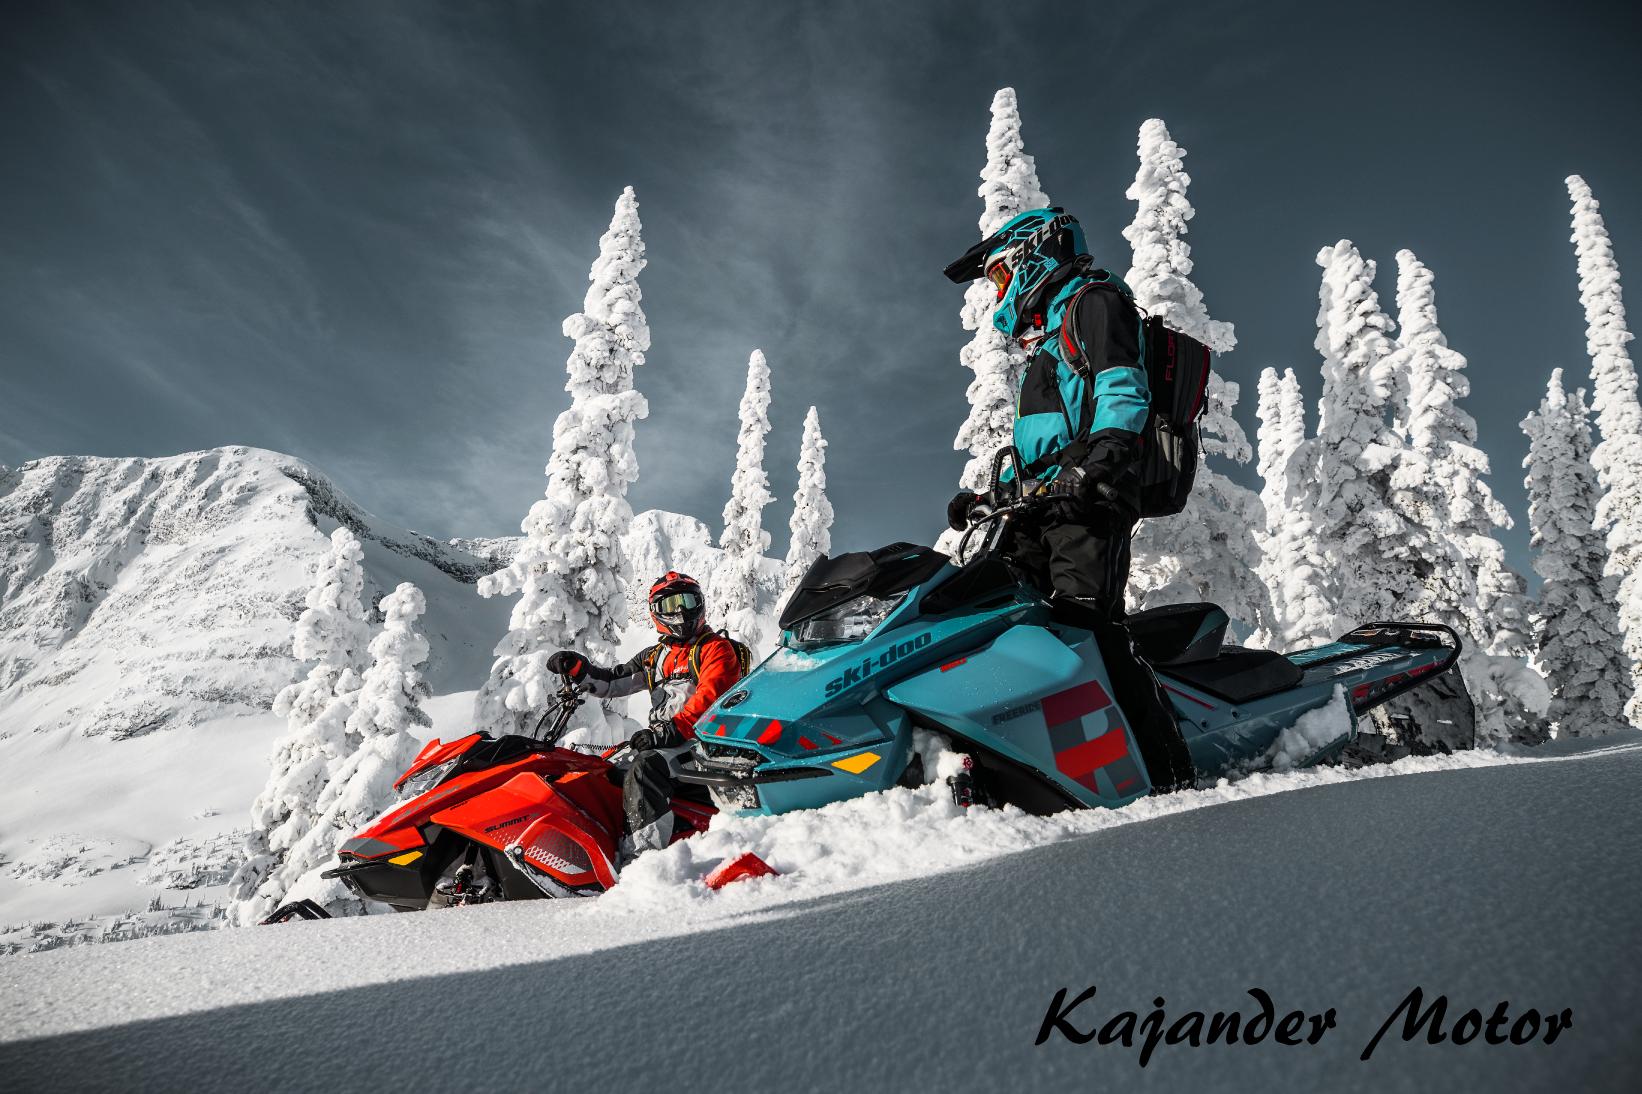 Ski-Doo 2019 freeride Kajander Motor